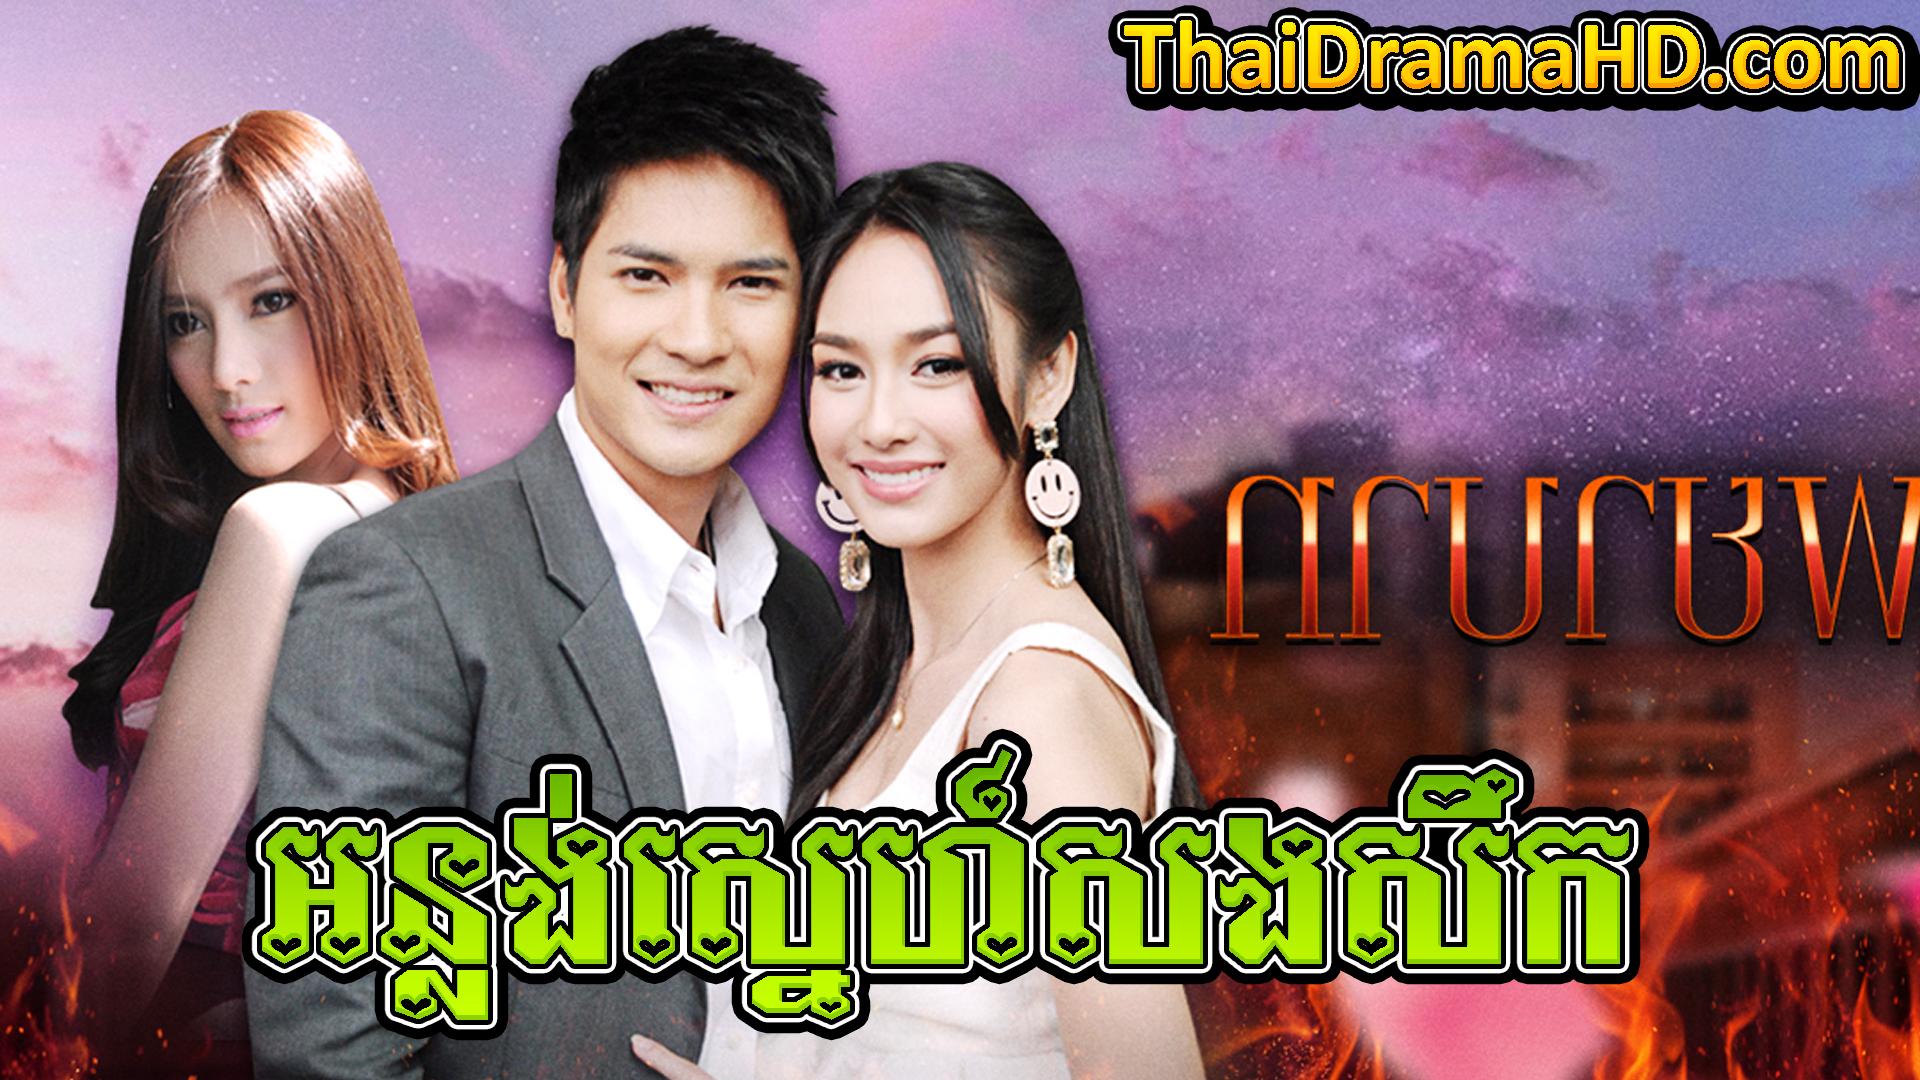 Anlung Sne Sangsoek | Thai Drama | Khmer Movie | Phumikhmer | movie-khmer | video4khmer | khmotions | kolabkhmer | khmer drama | ksdrama | cookingtips | roscheat | khmertimeskh | khmerkomsan | phumi7 | merlkon | film2us | movie2kh | sweetdrama | khmercitylove | khreplay | tvb cambodia drama | ckh7 | srokthai | phumimedia | phumi8 | khmer avenue | khmer search | Soyo | khmerfans